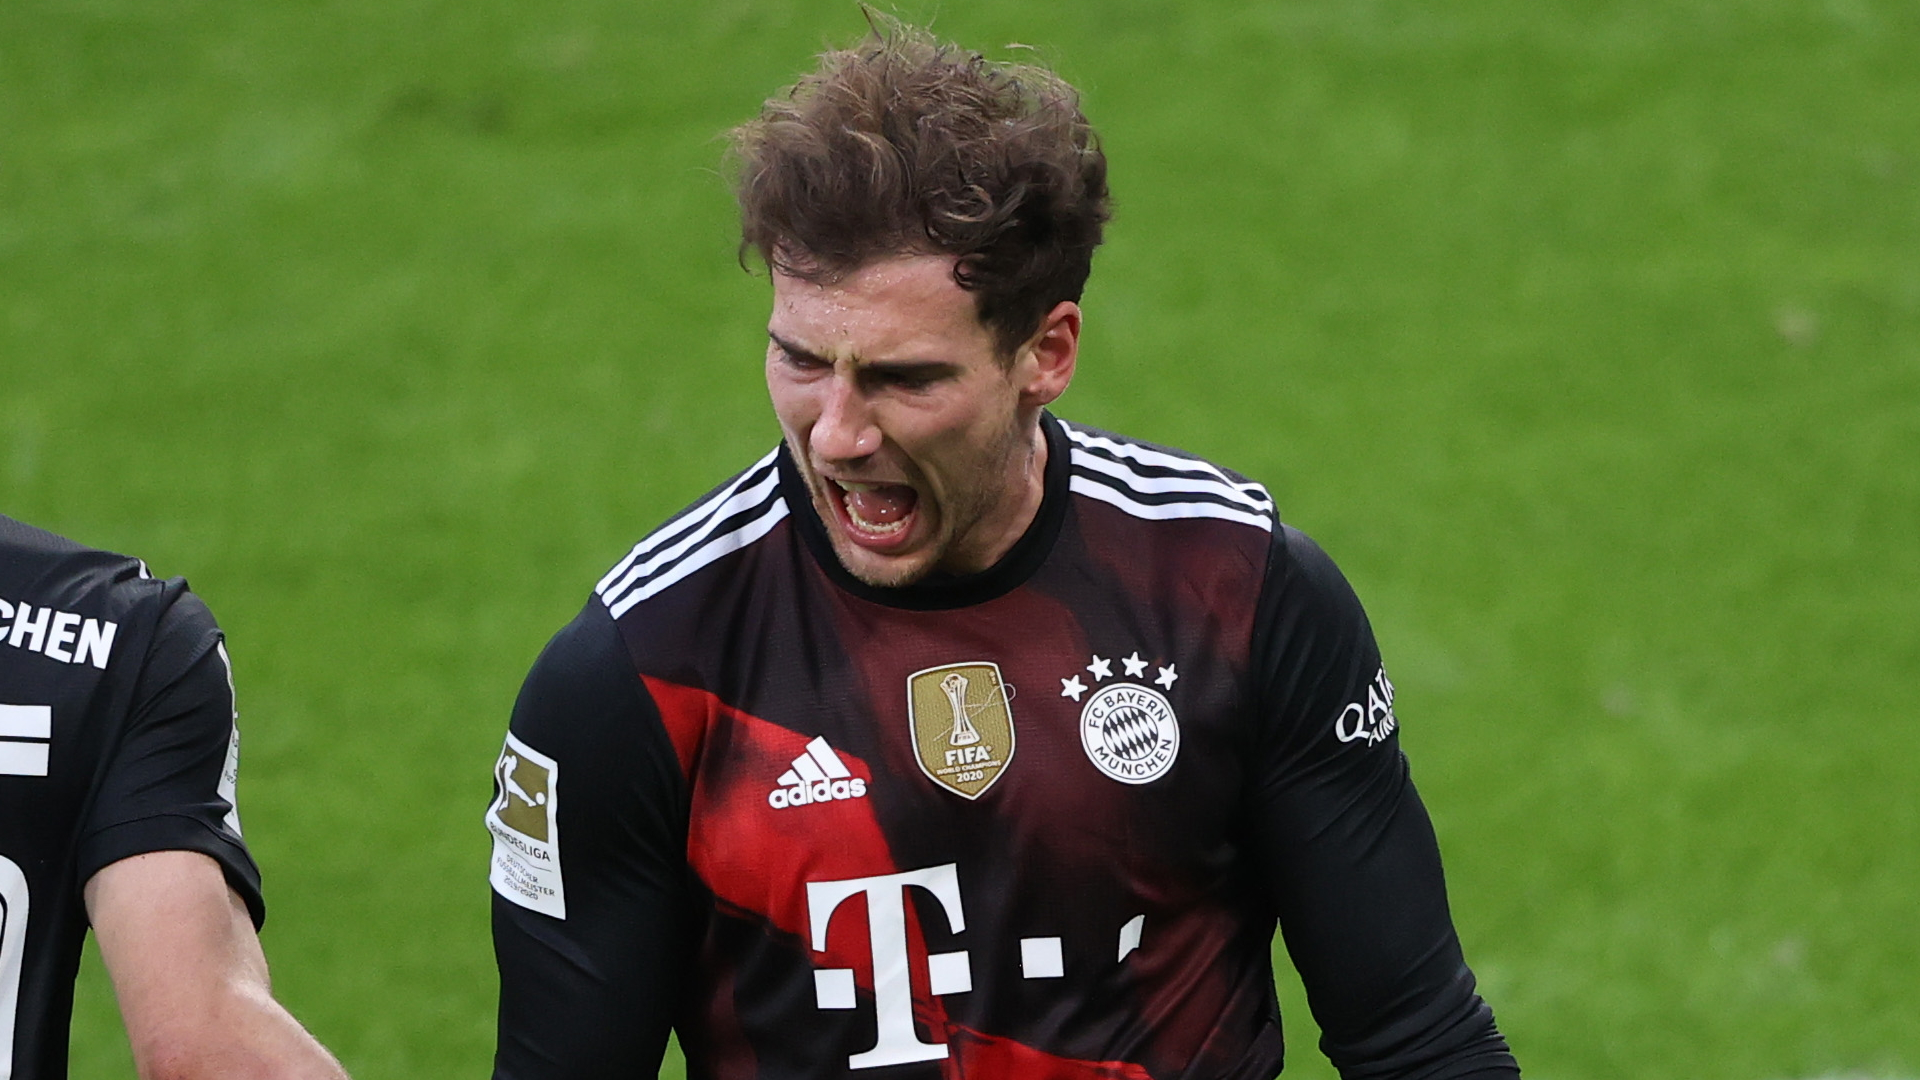 Man Utd-linked Goretzka focused on Bayern Munich stay despite contract talks stalling